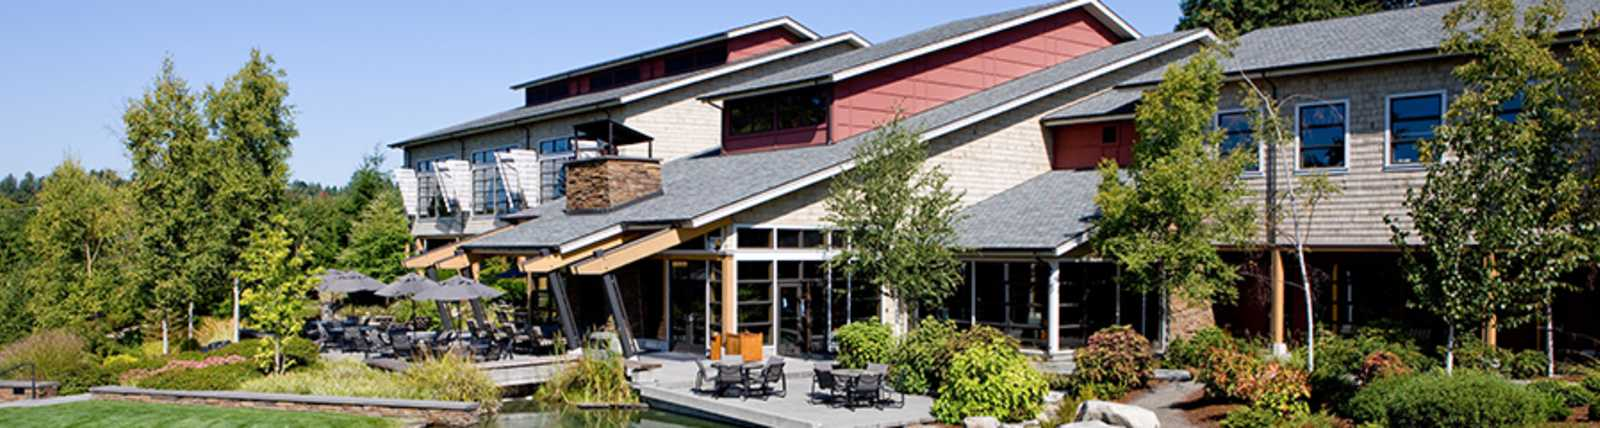 Cedarbrook Lodge Exterior